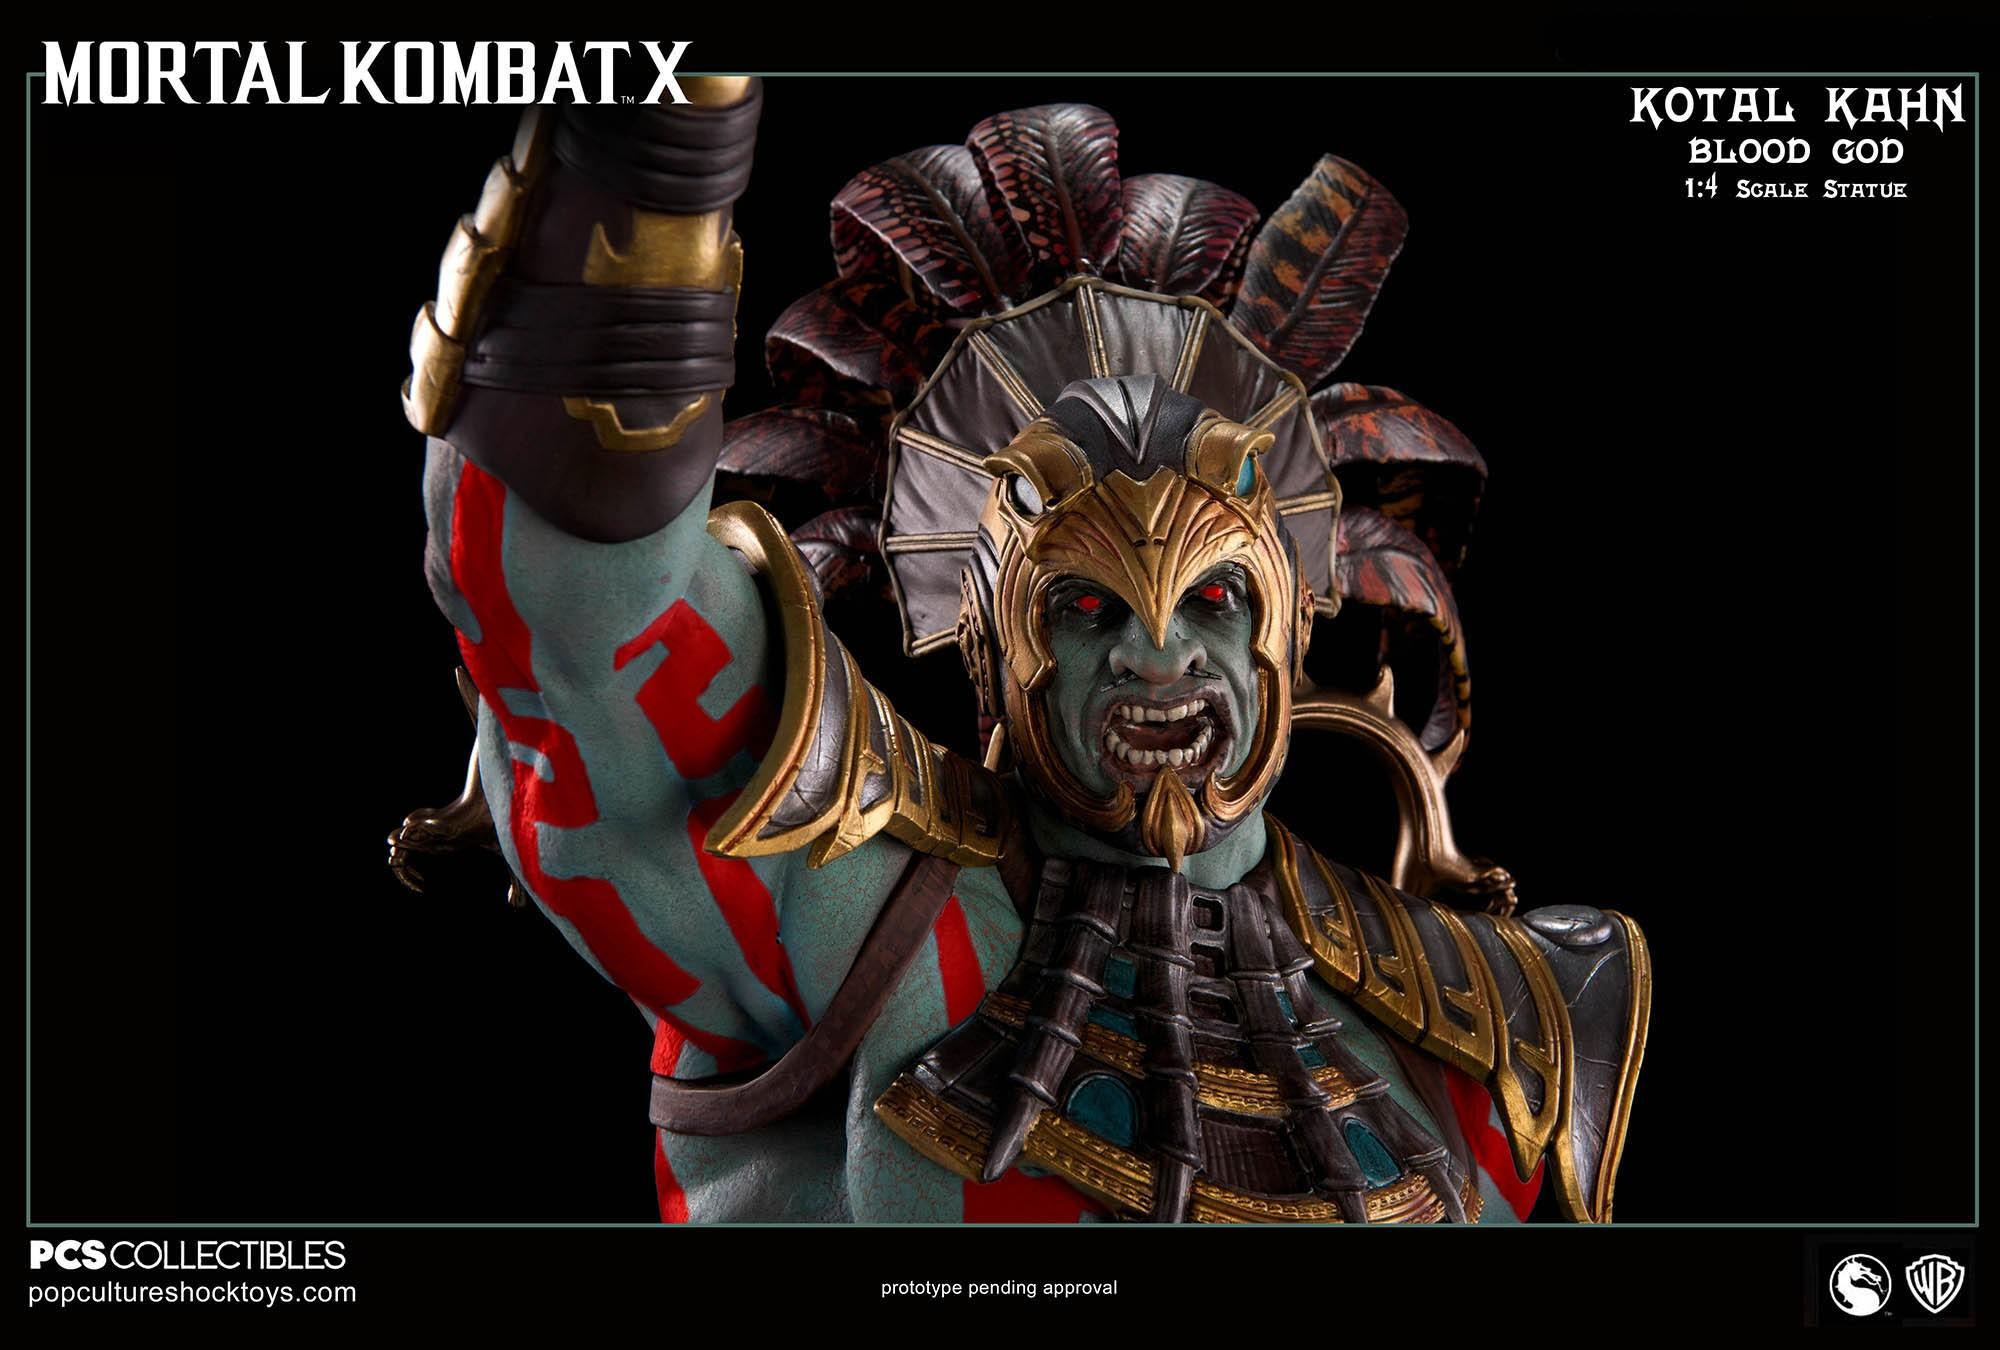 [Pop Culture Shock] Mortal Kombat X: Kotal Kahn 1:4 scale PCS-Kotal-Kahn-Blood-God-017